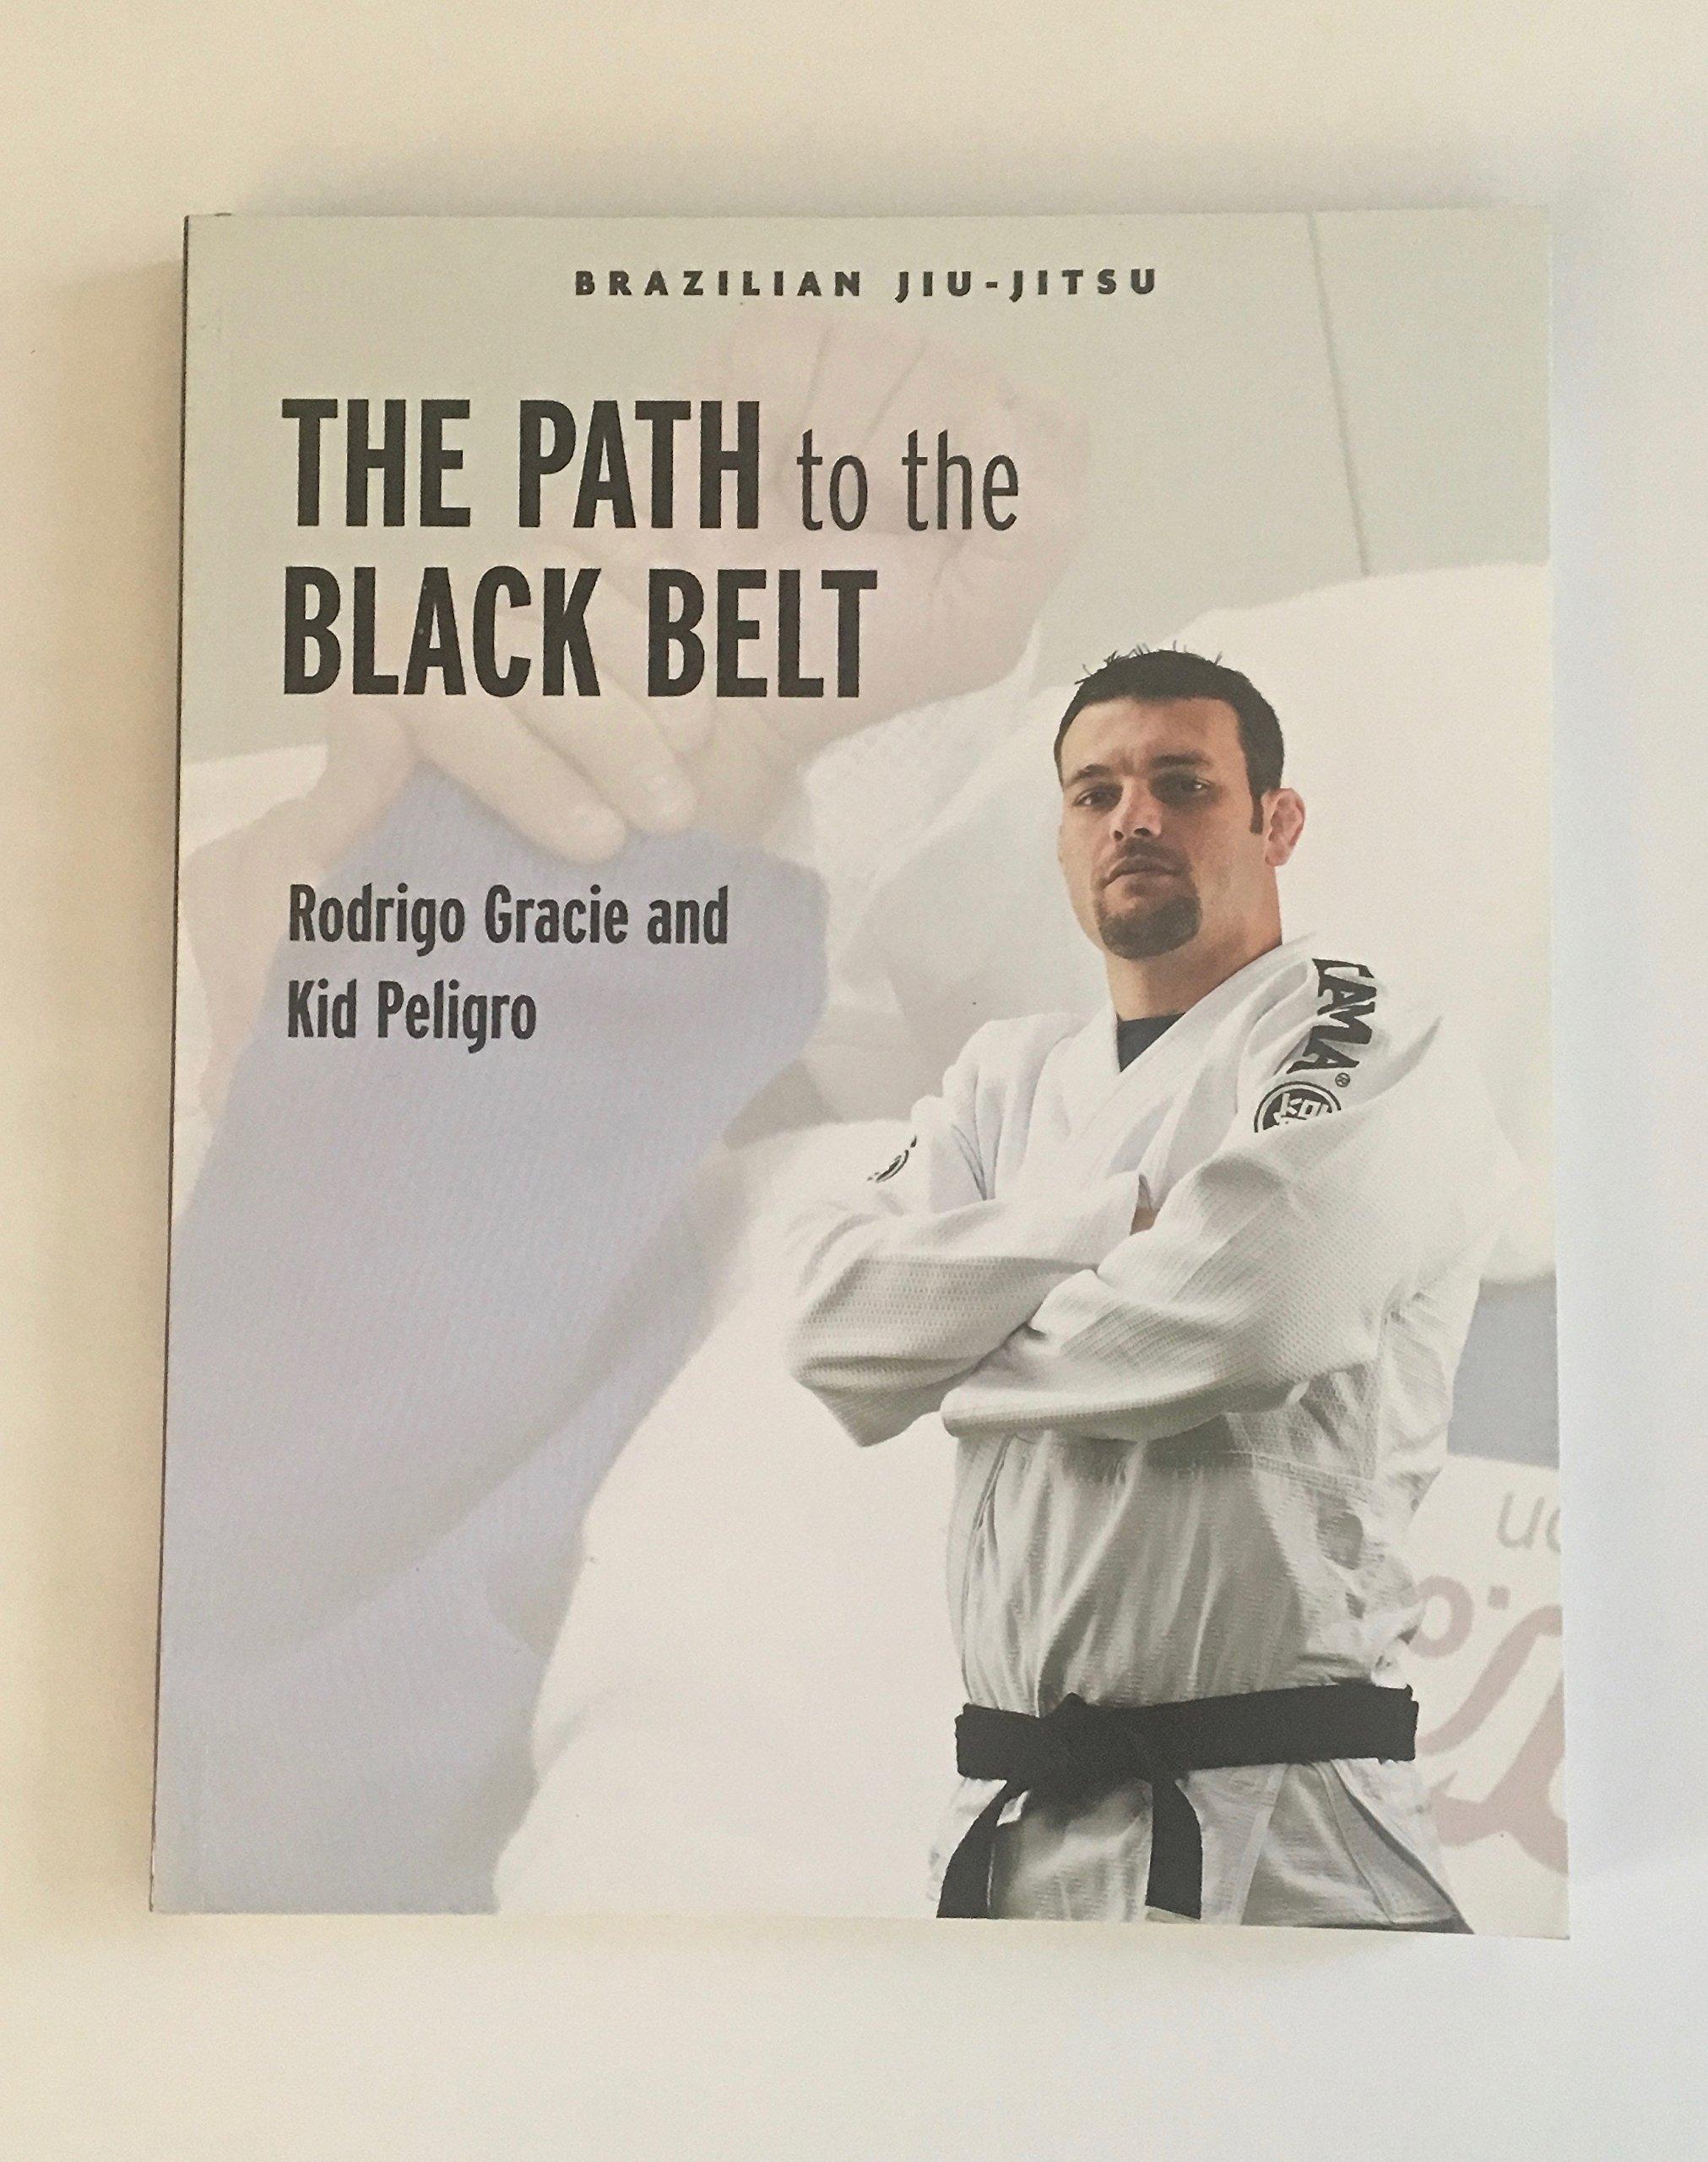 Brazilian Jiu-Jitsu: The Path to the Black Belt (1